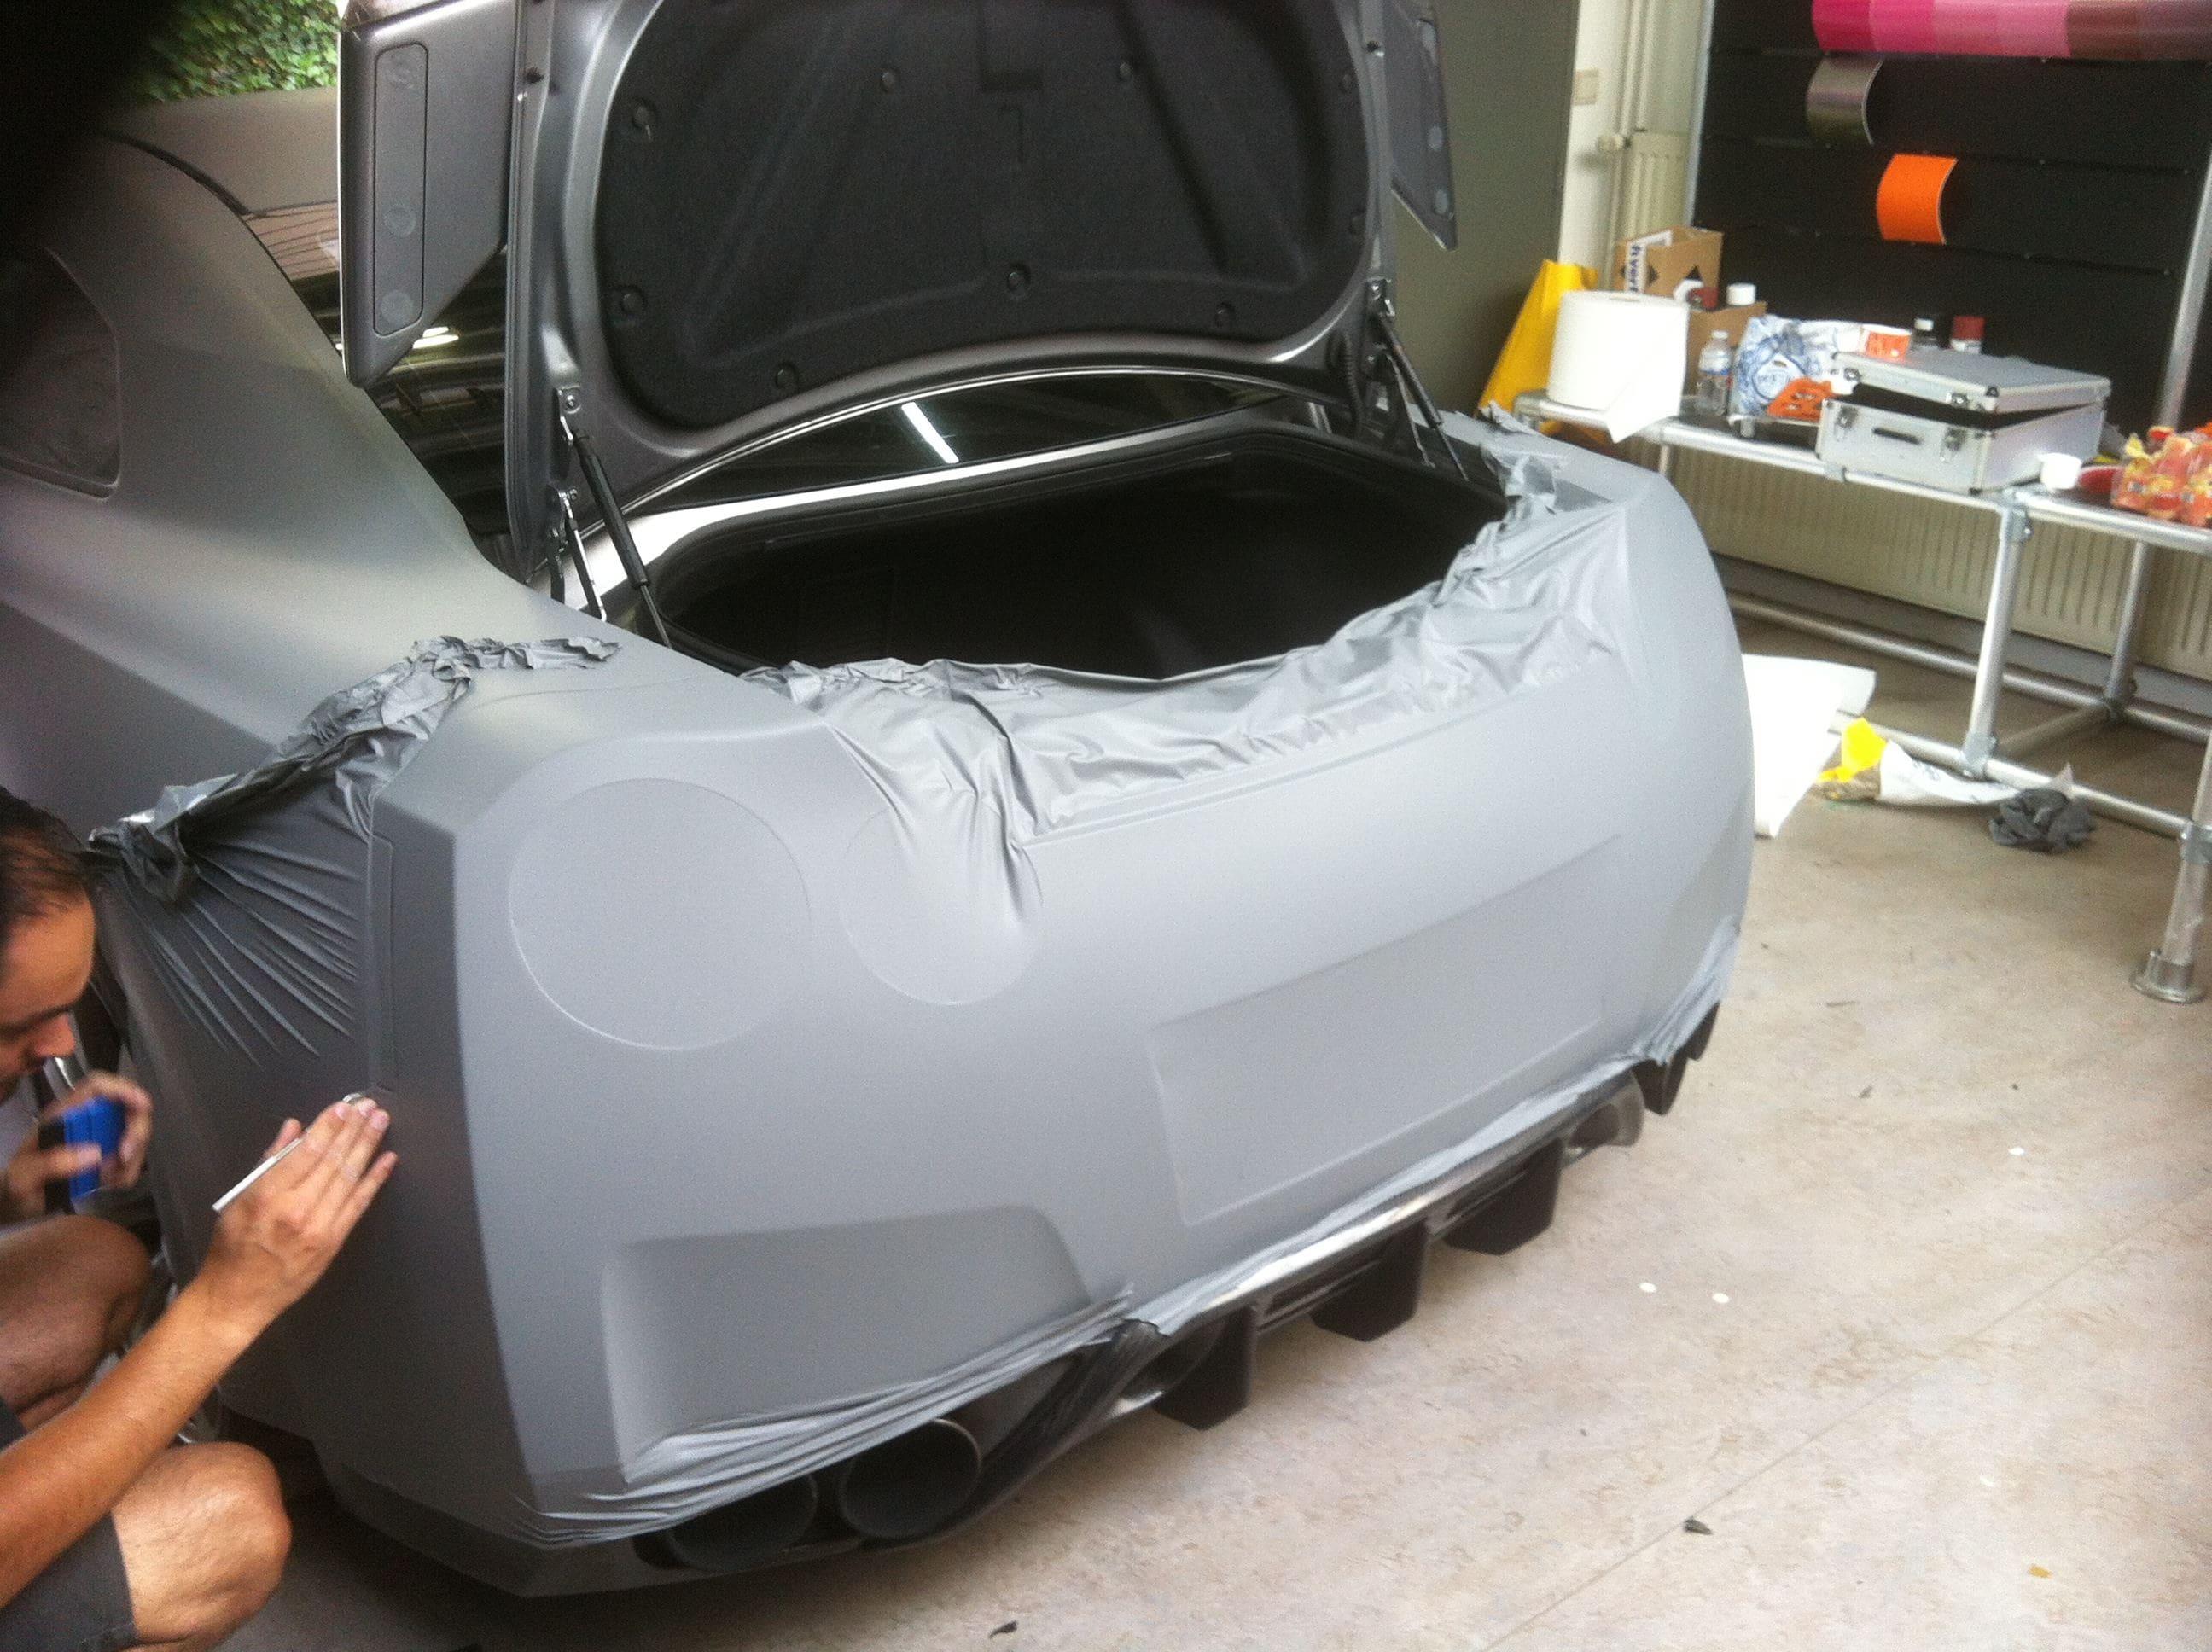 Nissan GT-R met Mat Grijze Wrap, Carwrapping door Wrapmyride.nu Foto-nr:6549, ©2020